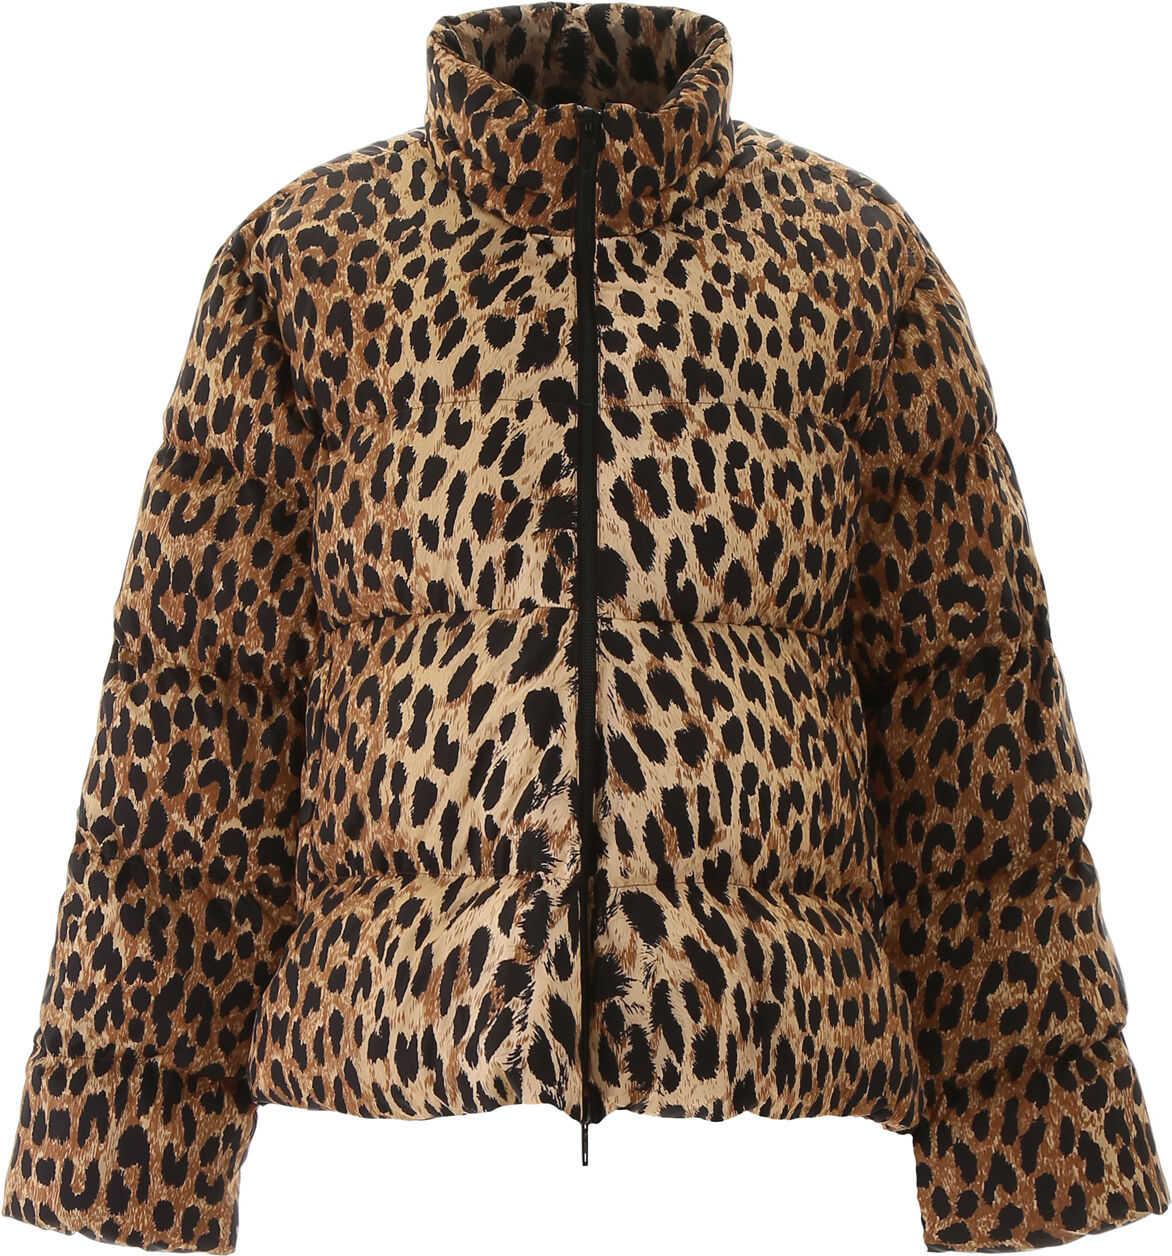 Balenciaga Leopard-Printed Puffer Jacket BEIGE